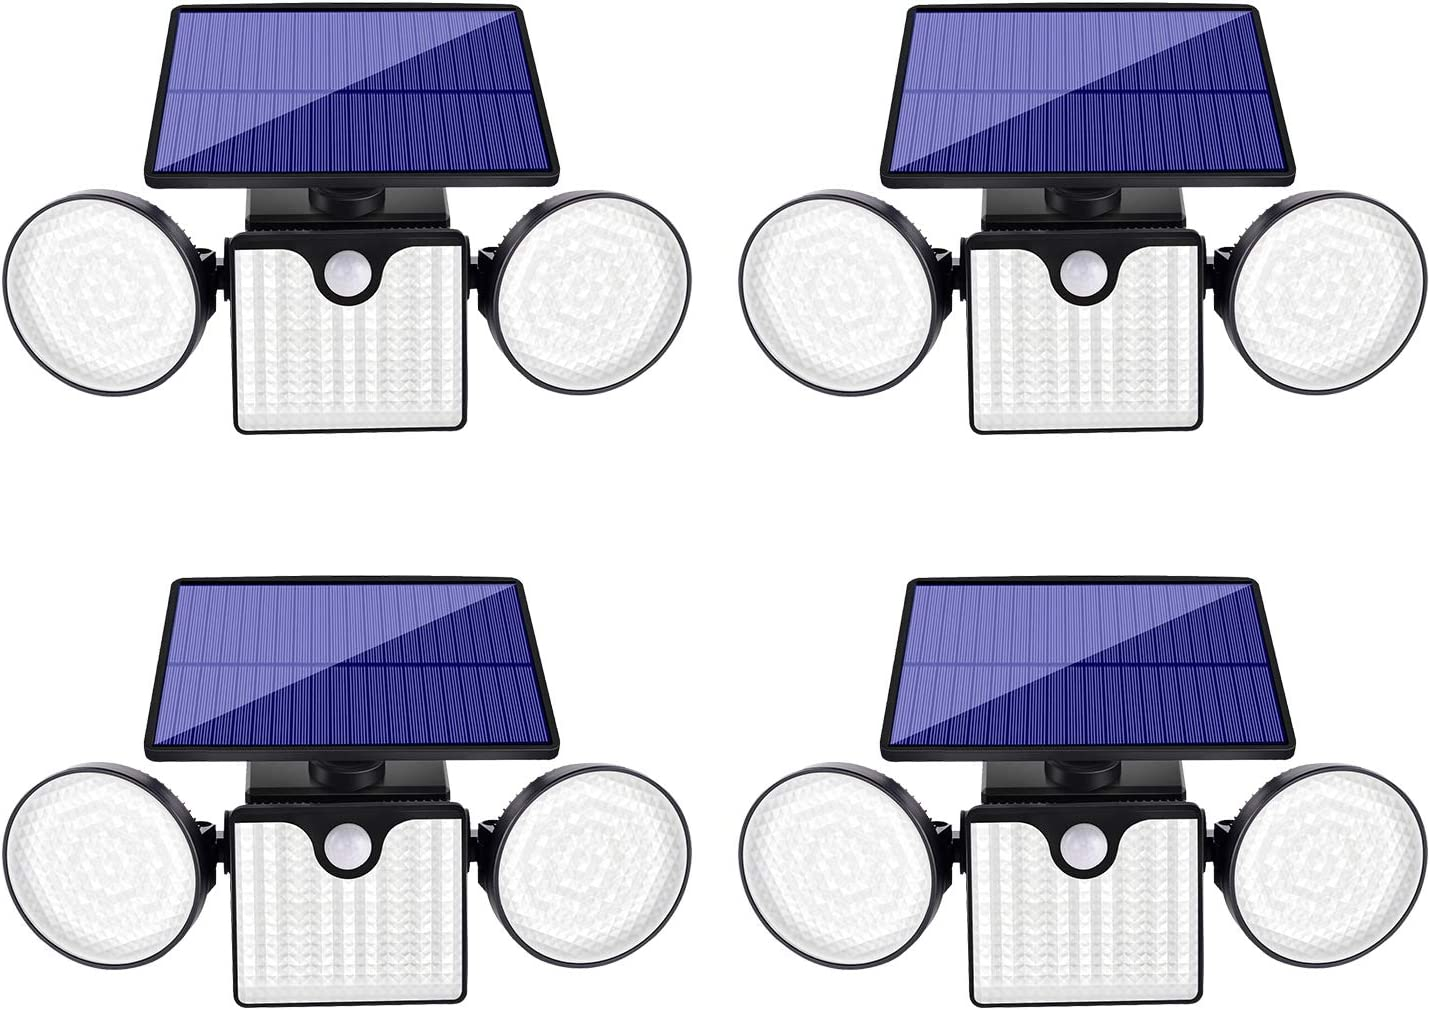 Ollivage Upgrade Weekly update Solar Motion Sensor Lights Attention brand Outdoor Heads Secu 3